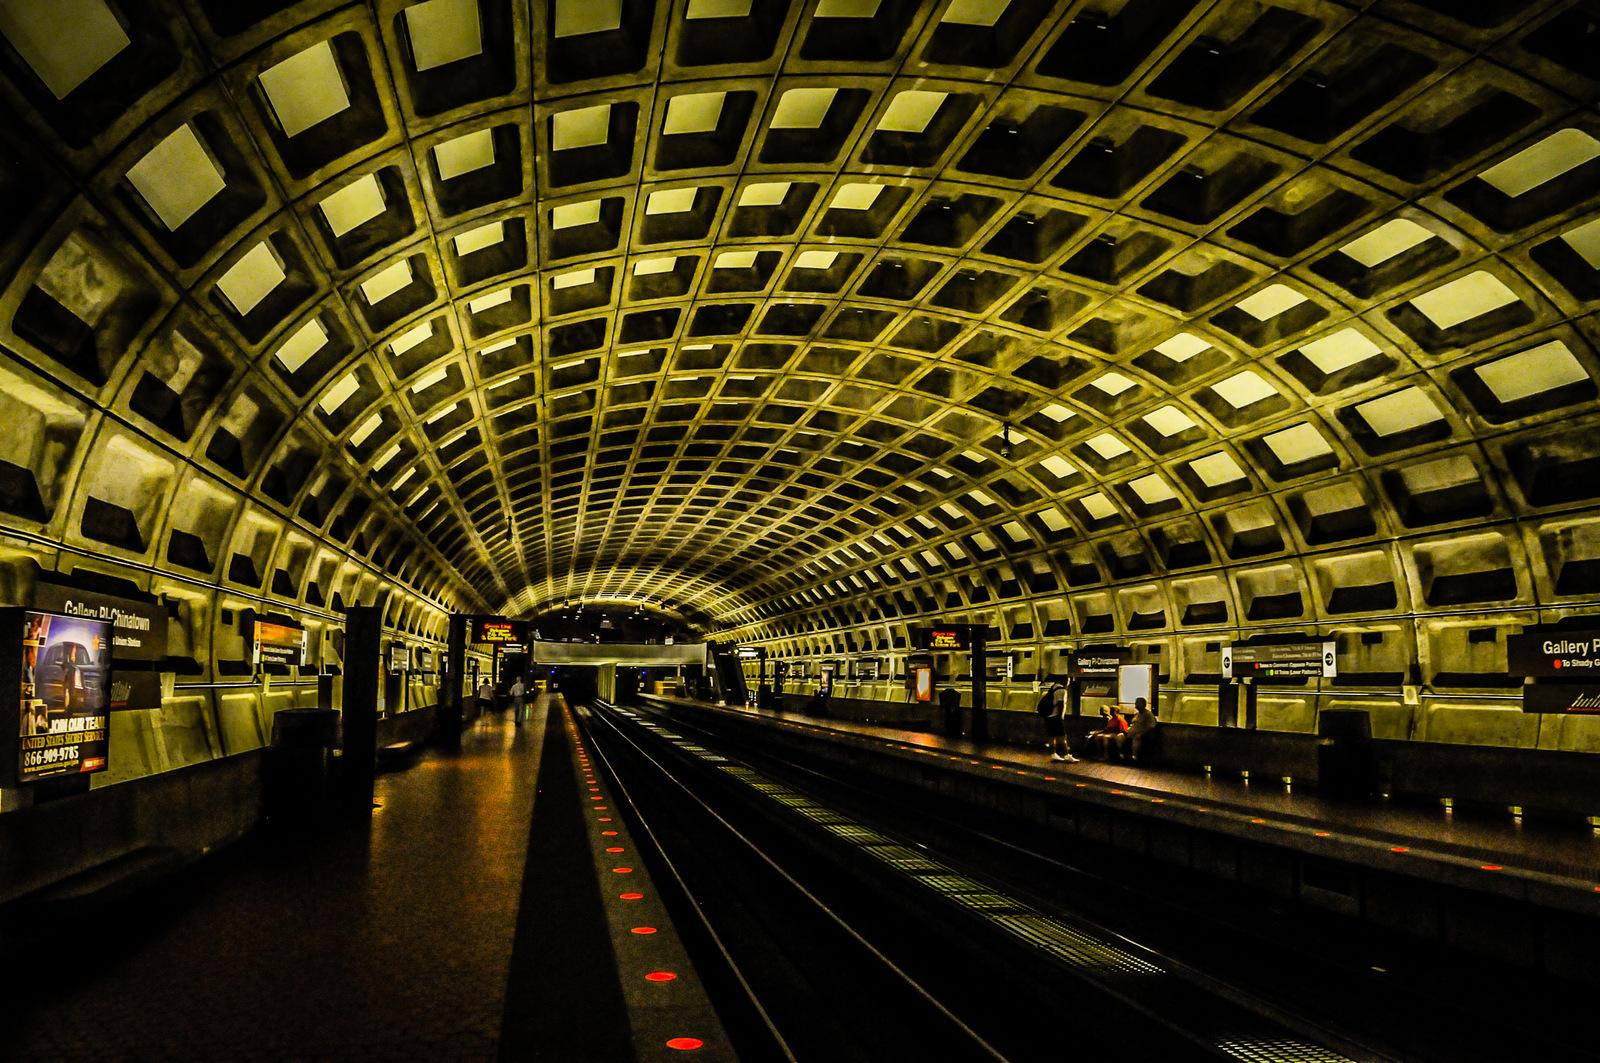 The D.C Metro